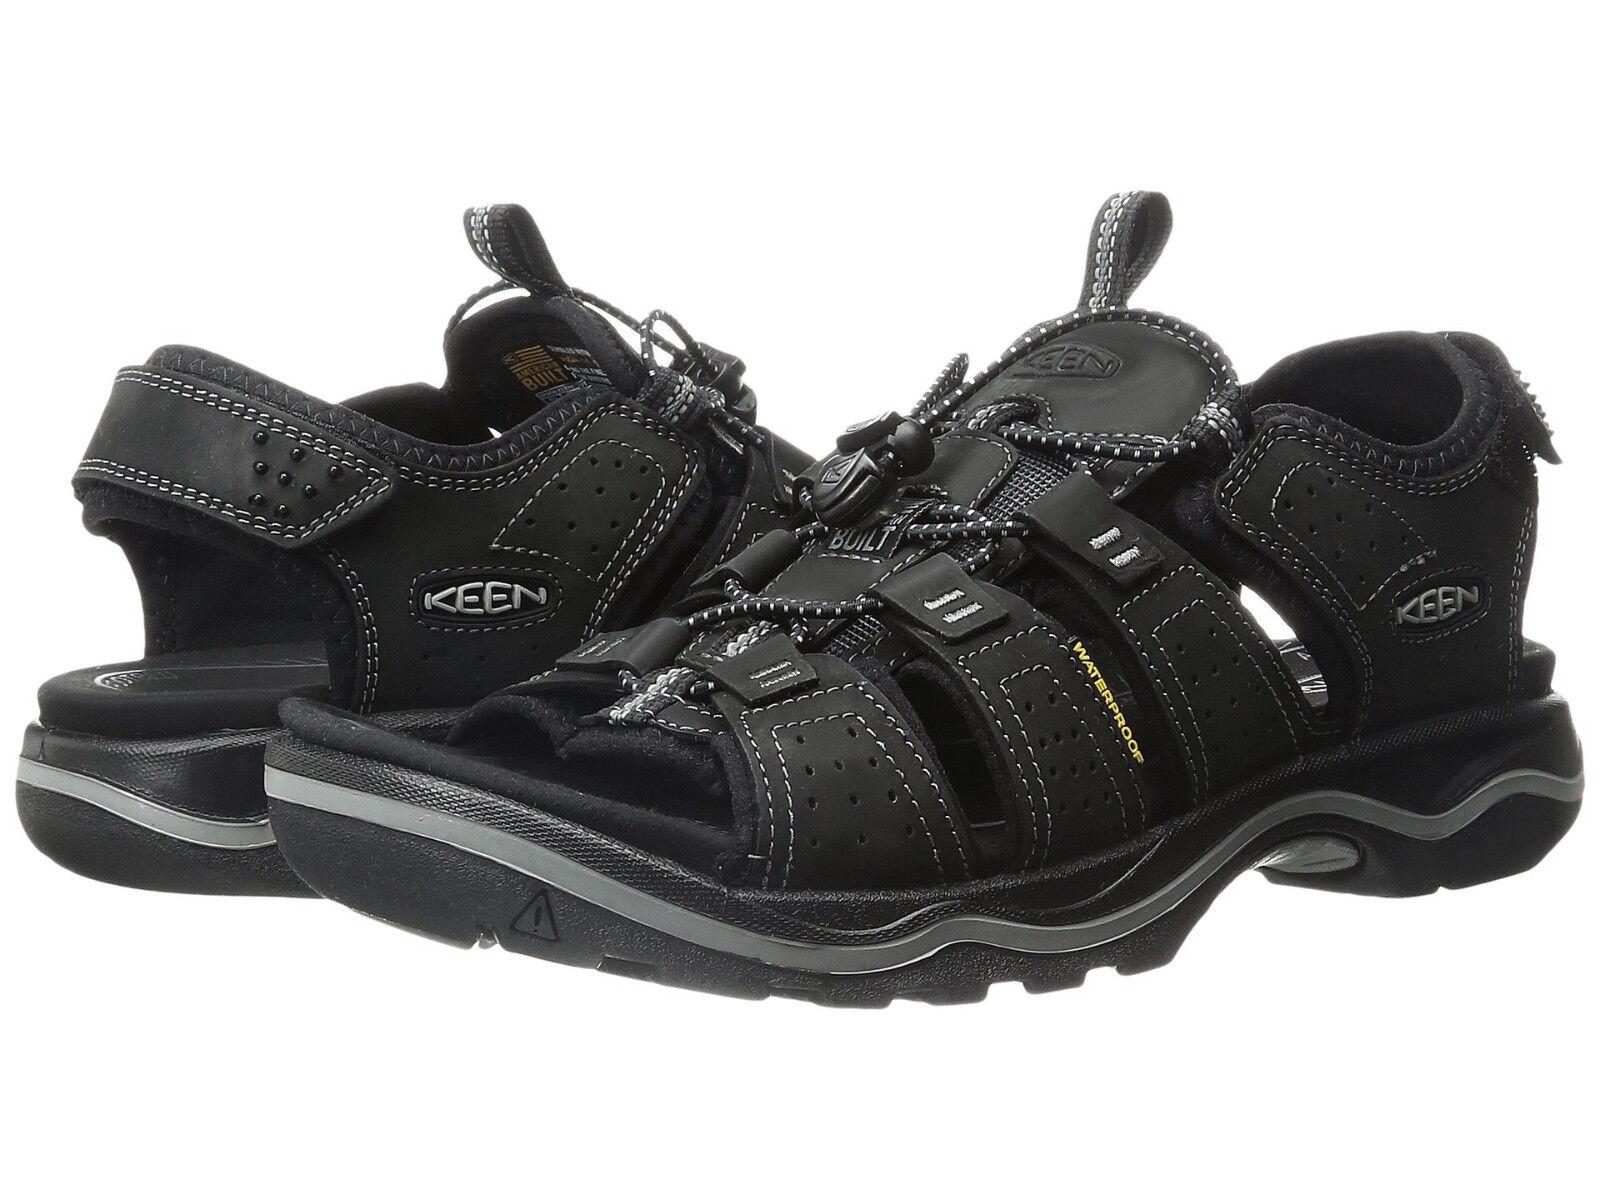 Keen Mens Men's Rialto Open Toe Adjustable Casual Ankle Strap Sandals shoes